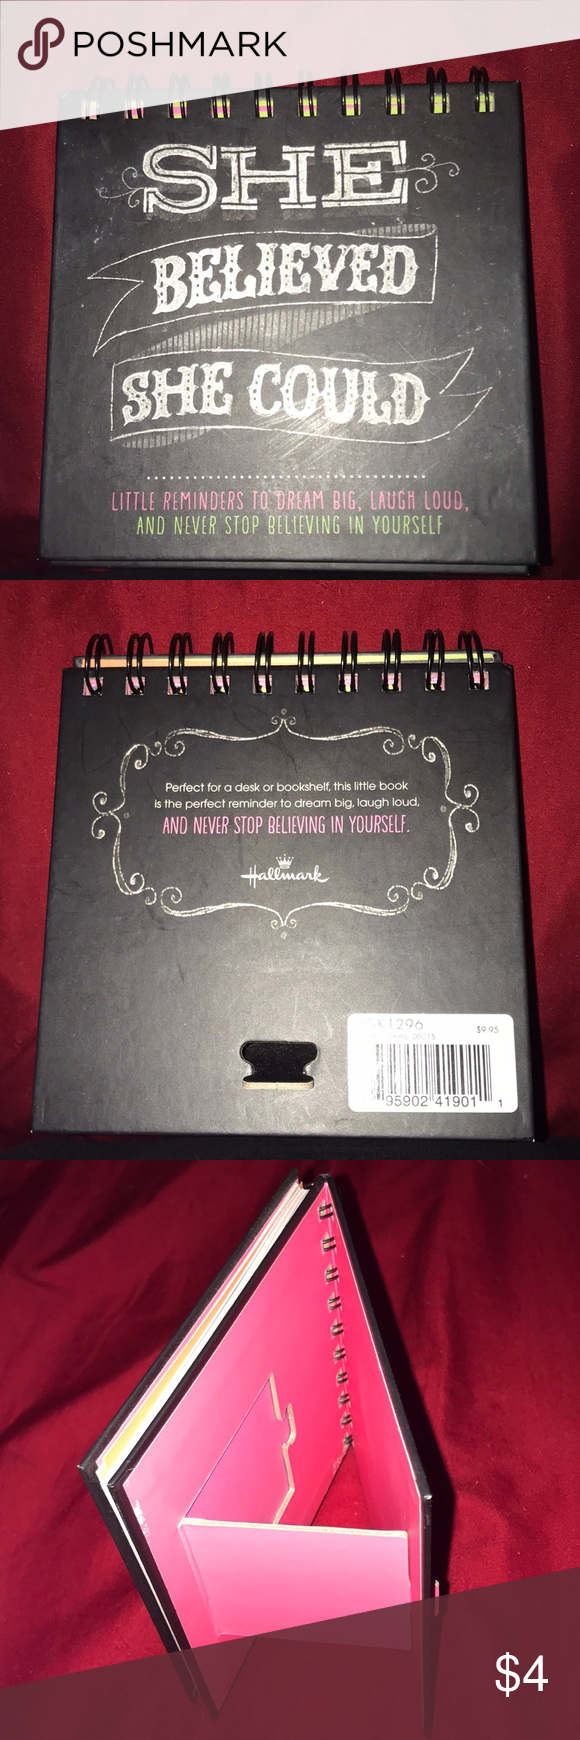 Hallmark Inspiration Flipbook Dream Book Flip Book Dream Book Books